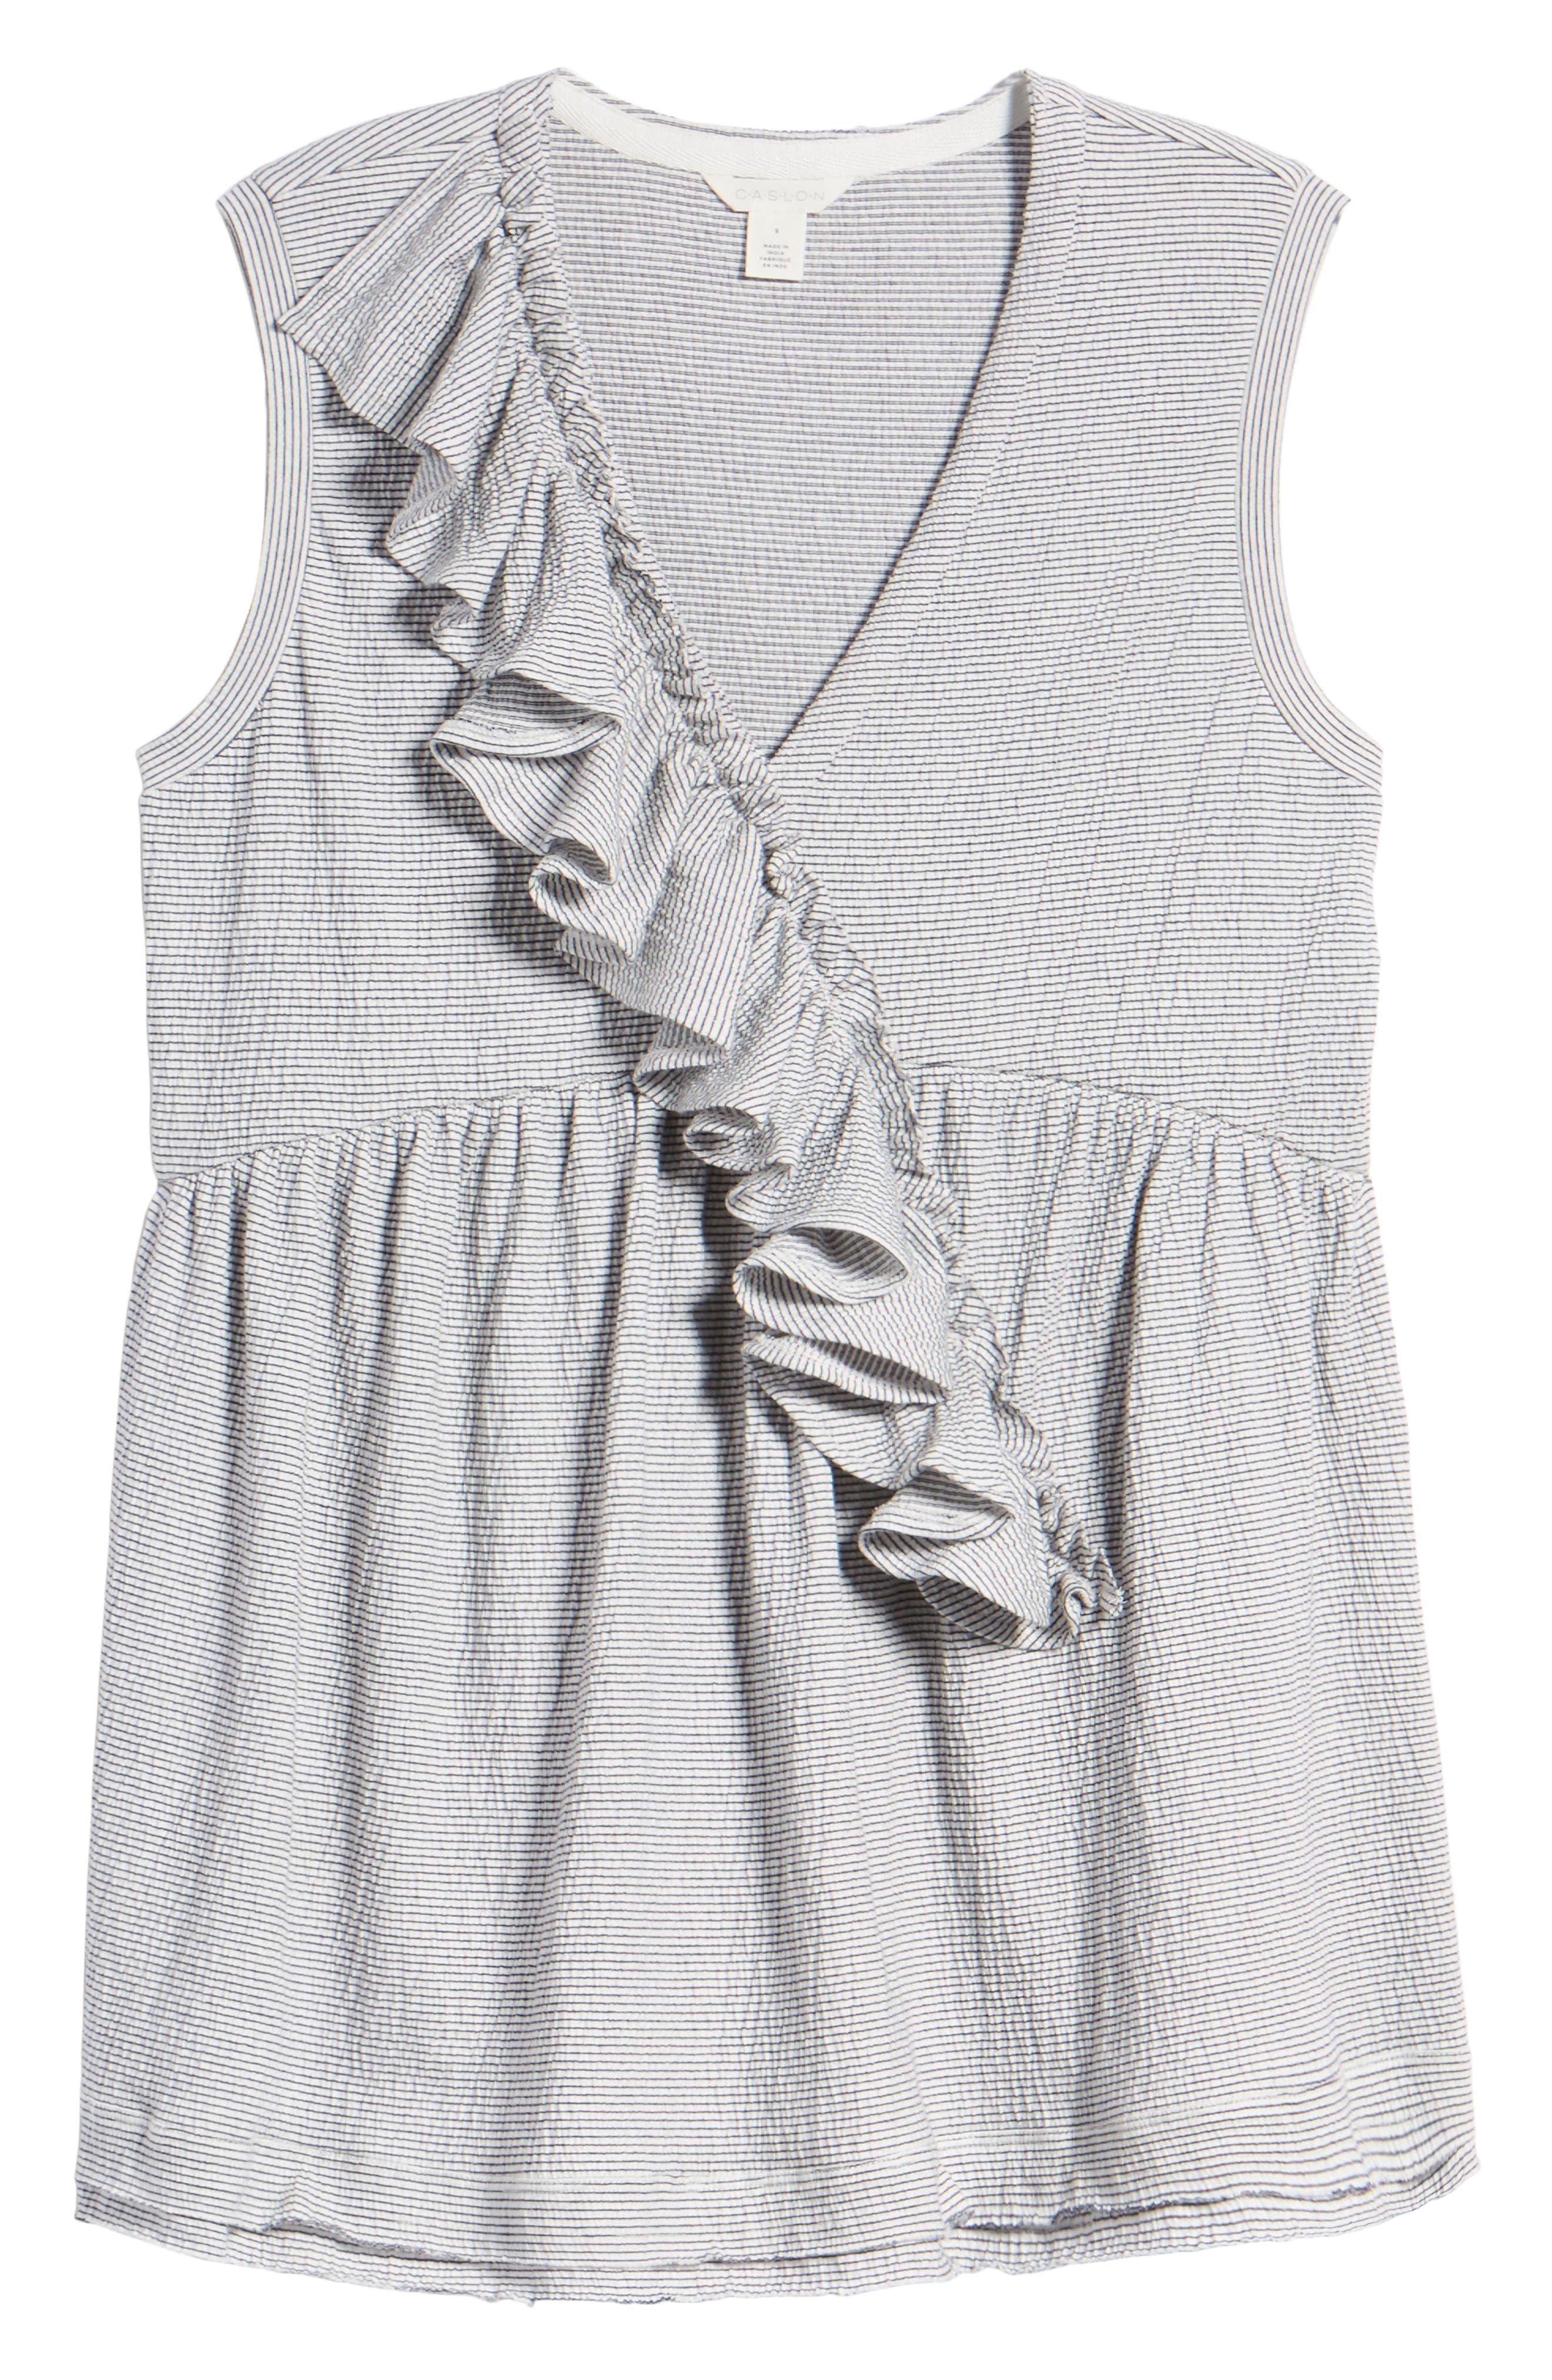 Ruffle Knit Top,                             Alternate thumbnail 7, color,                             Ivory- Navy Lynn Stripe